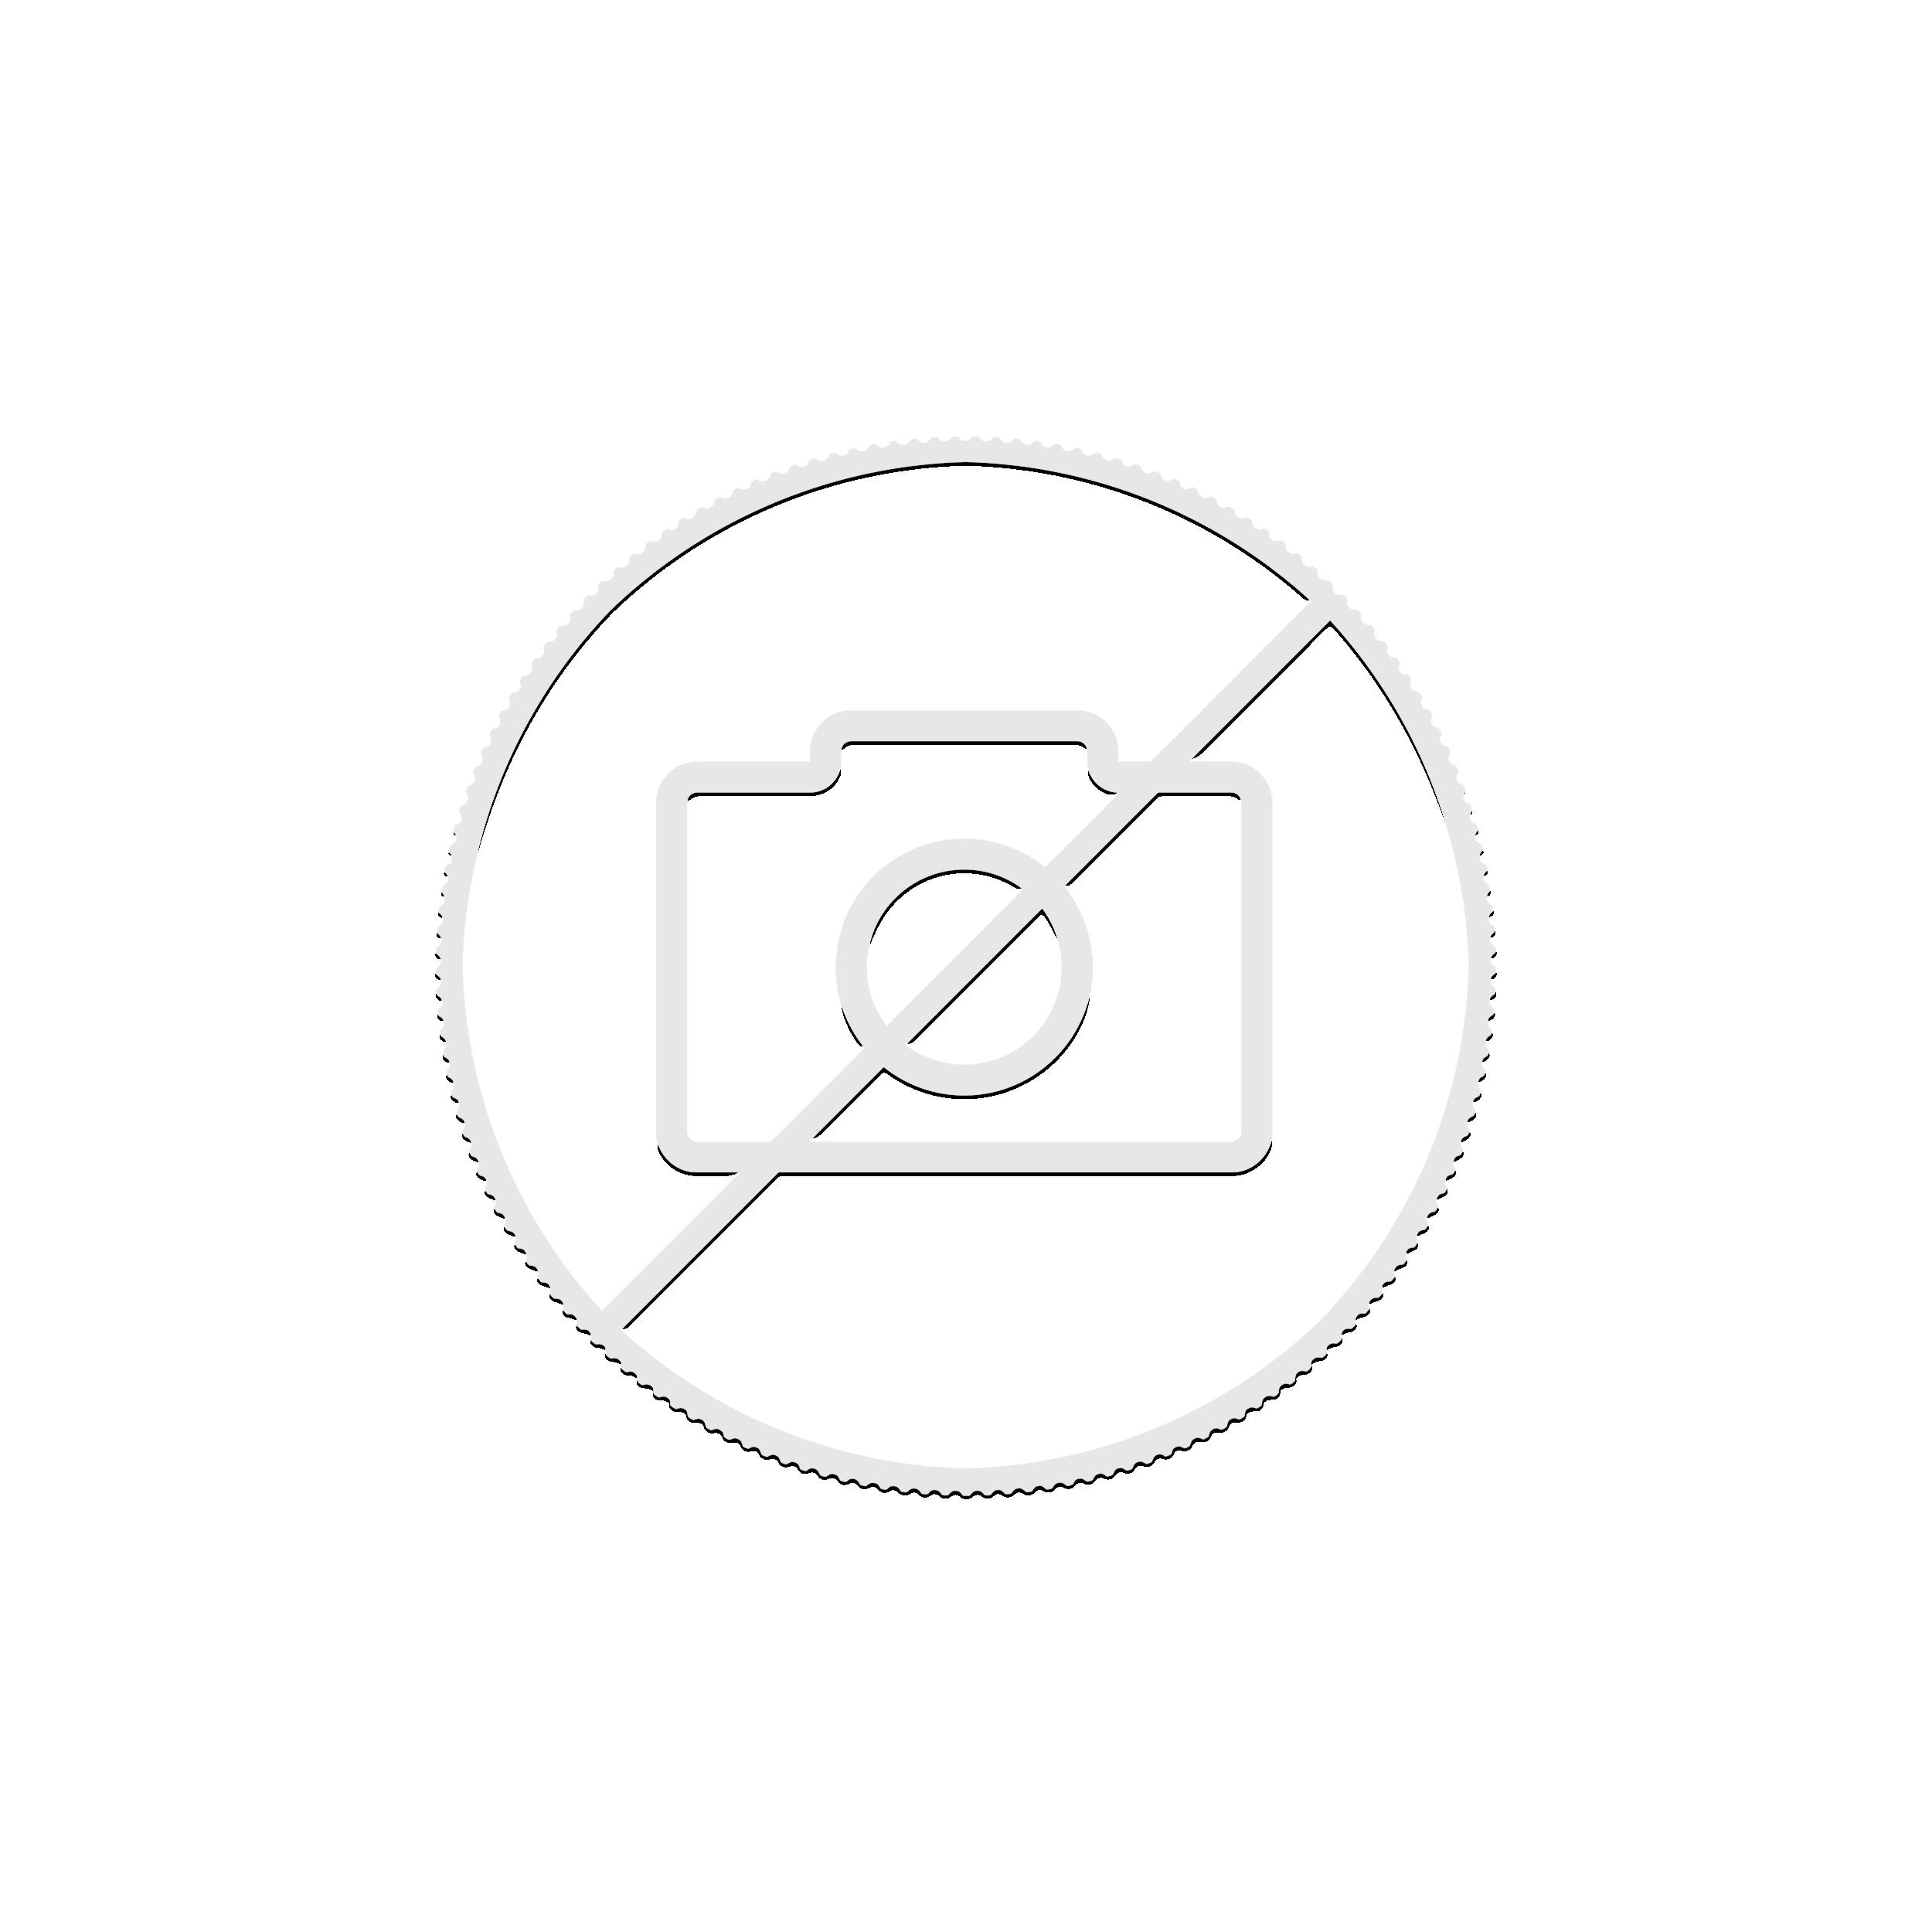 1 Troy ounce gouden munt baar Rectangular Dragon 2018